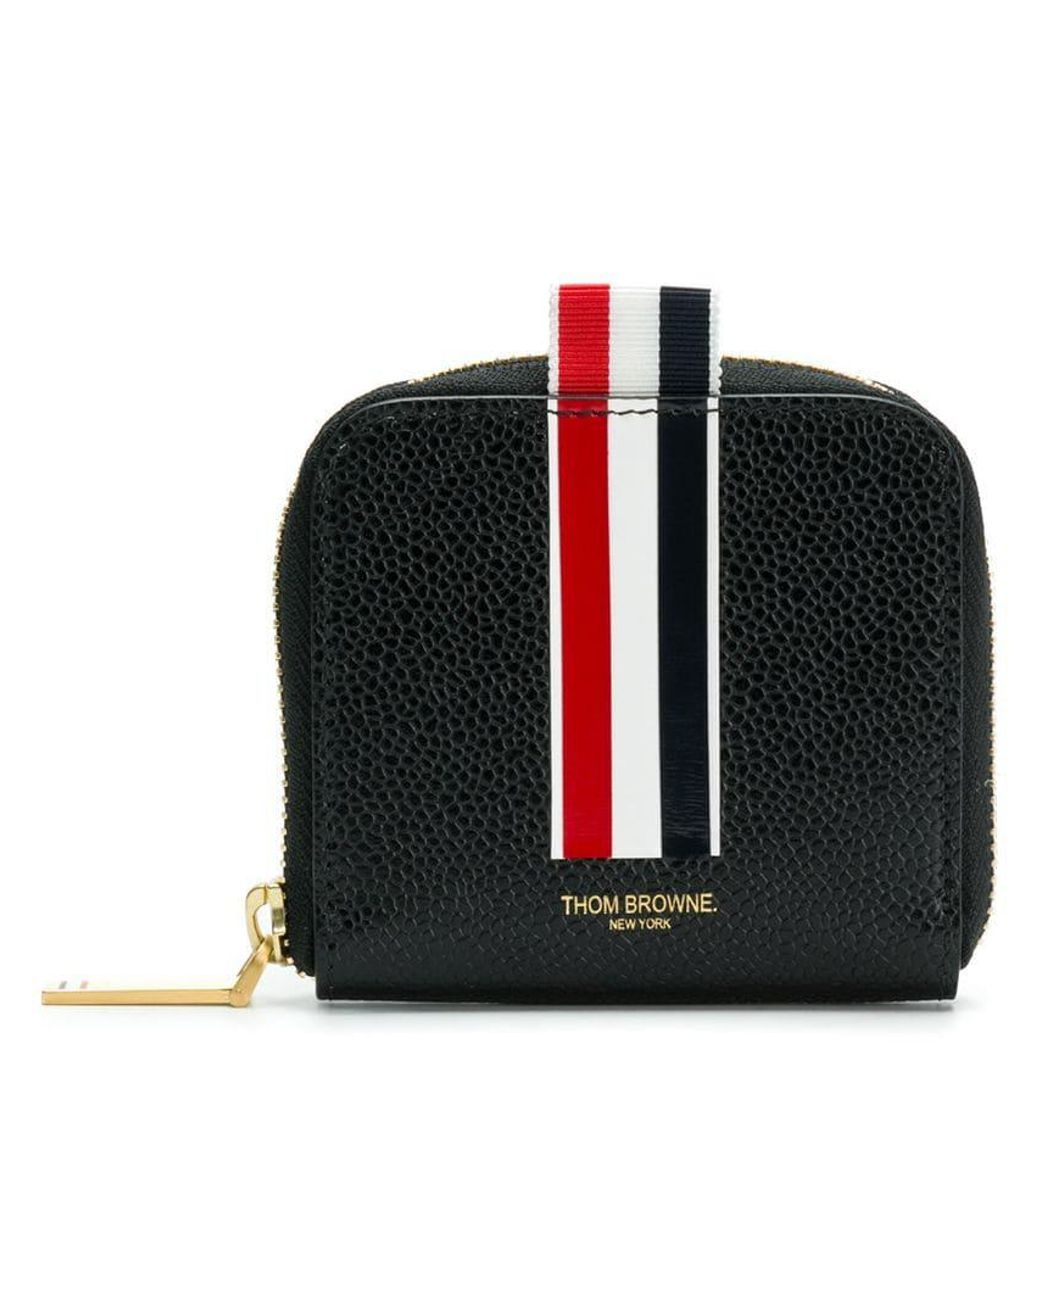 b5981032d42b Lyst - Thom Browne Vertical Inatarsia Stripe Zip-around Cardholder In Pebble  Grain Leather in Black for Men